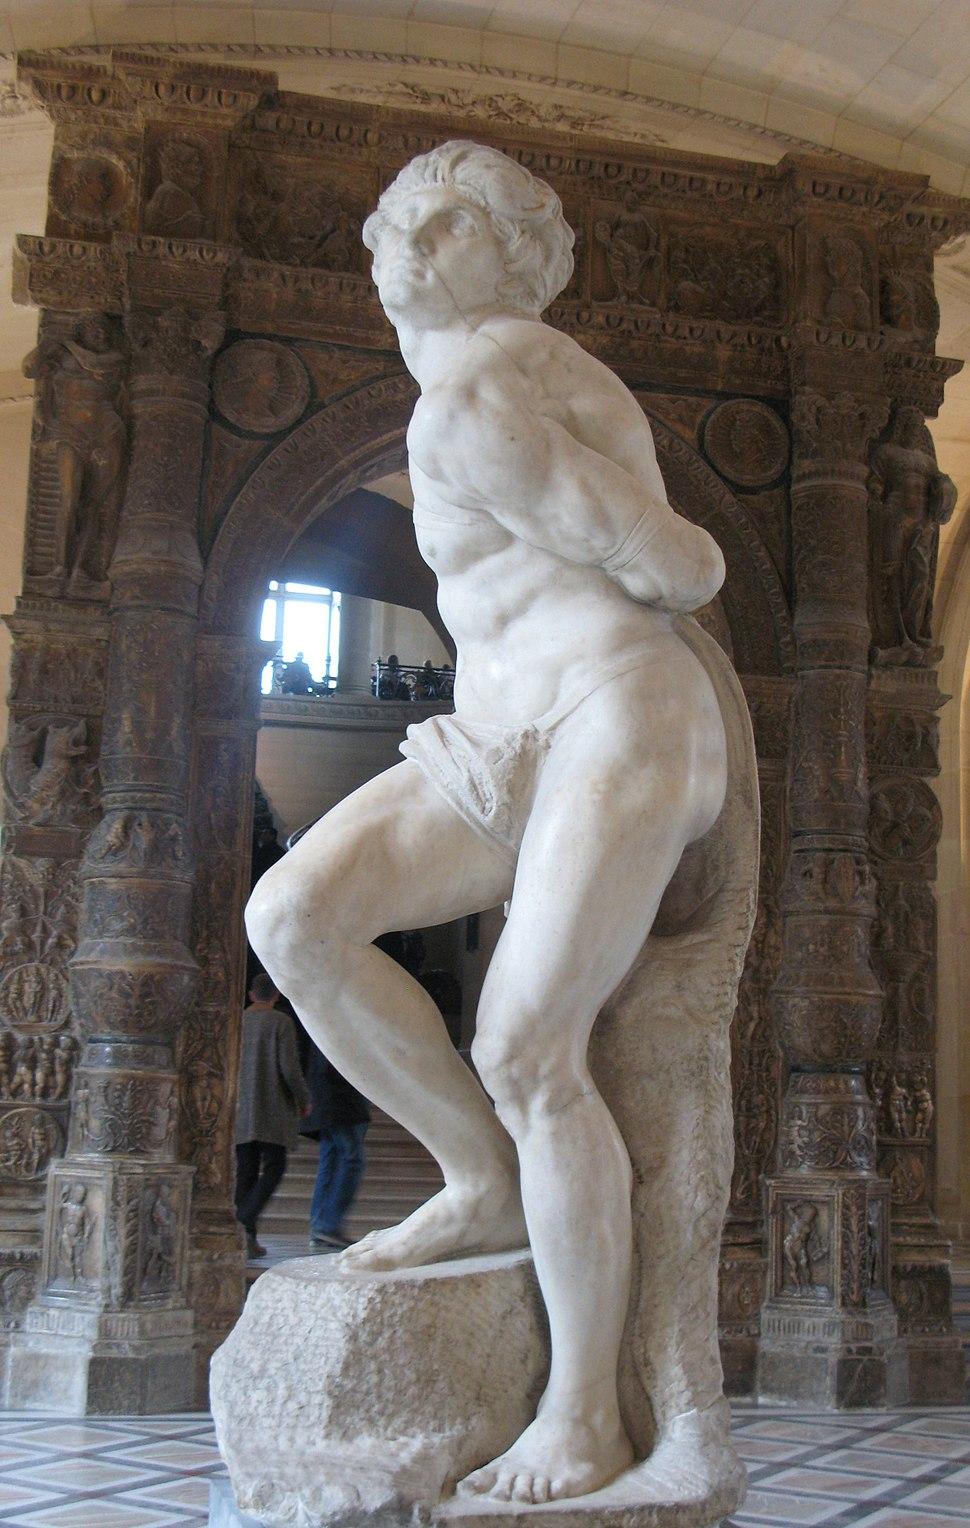 Michelangelo-The Rebellious Slave